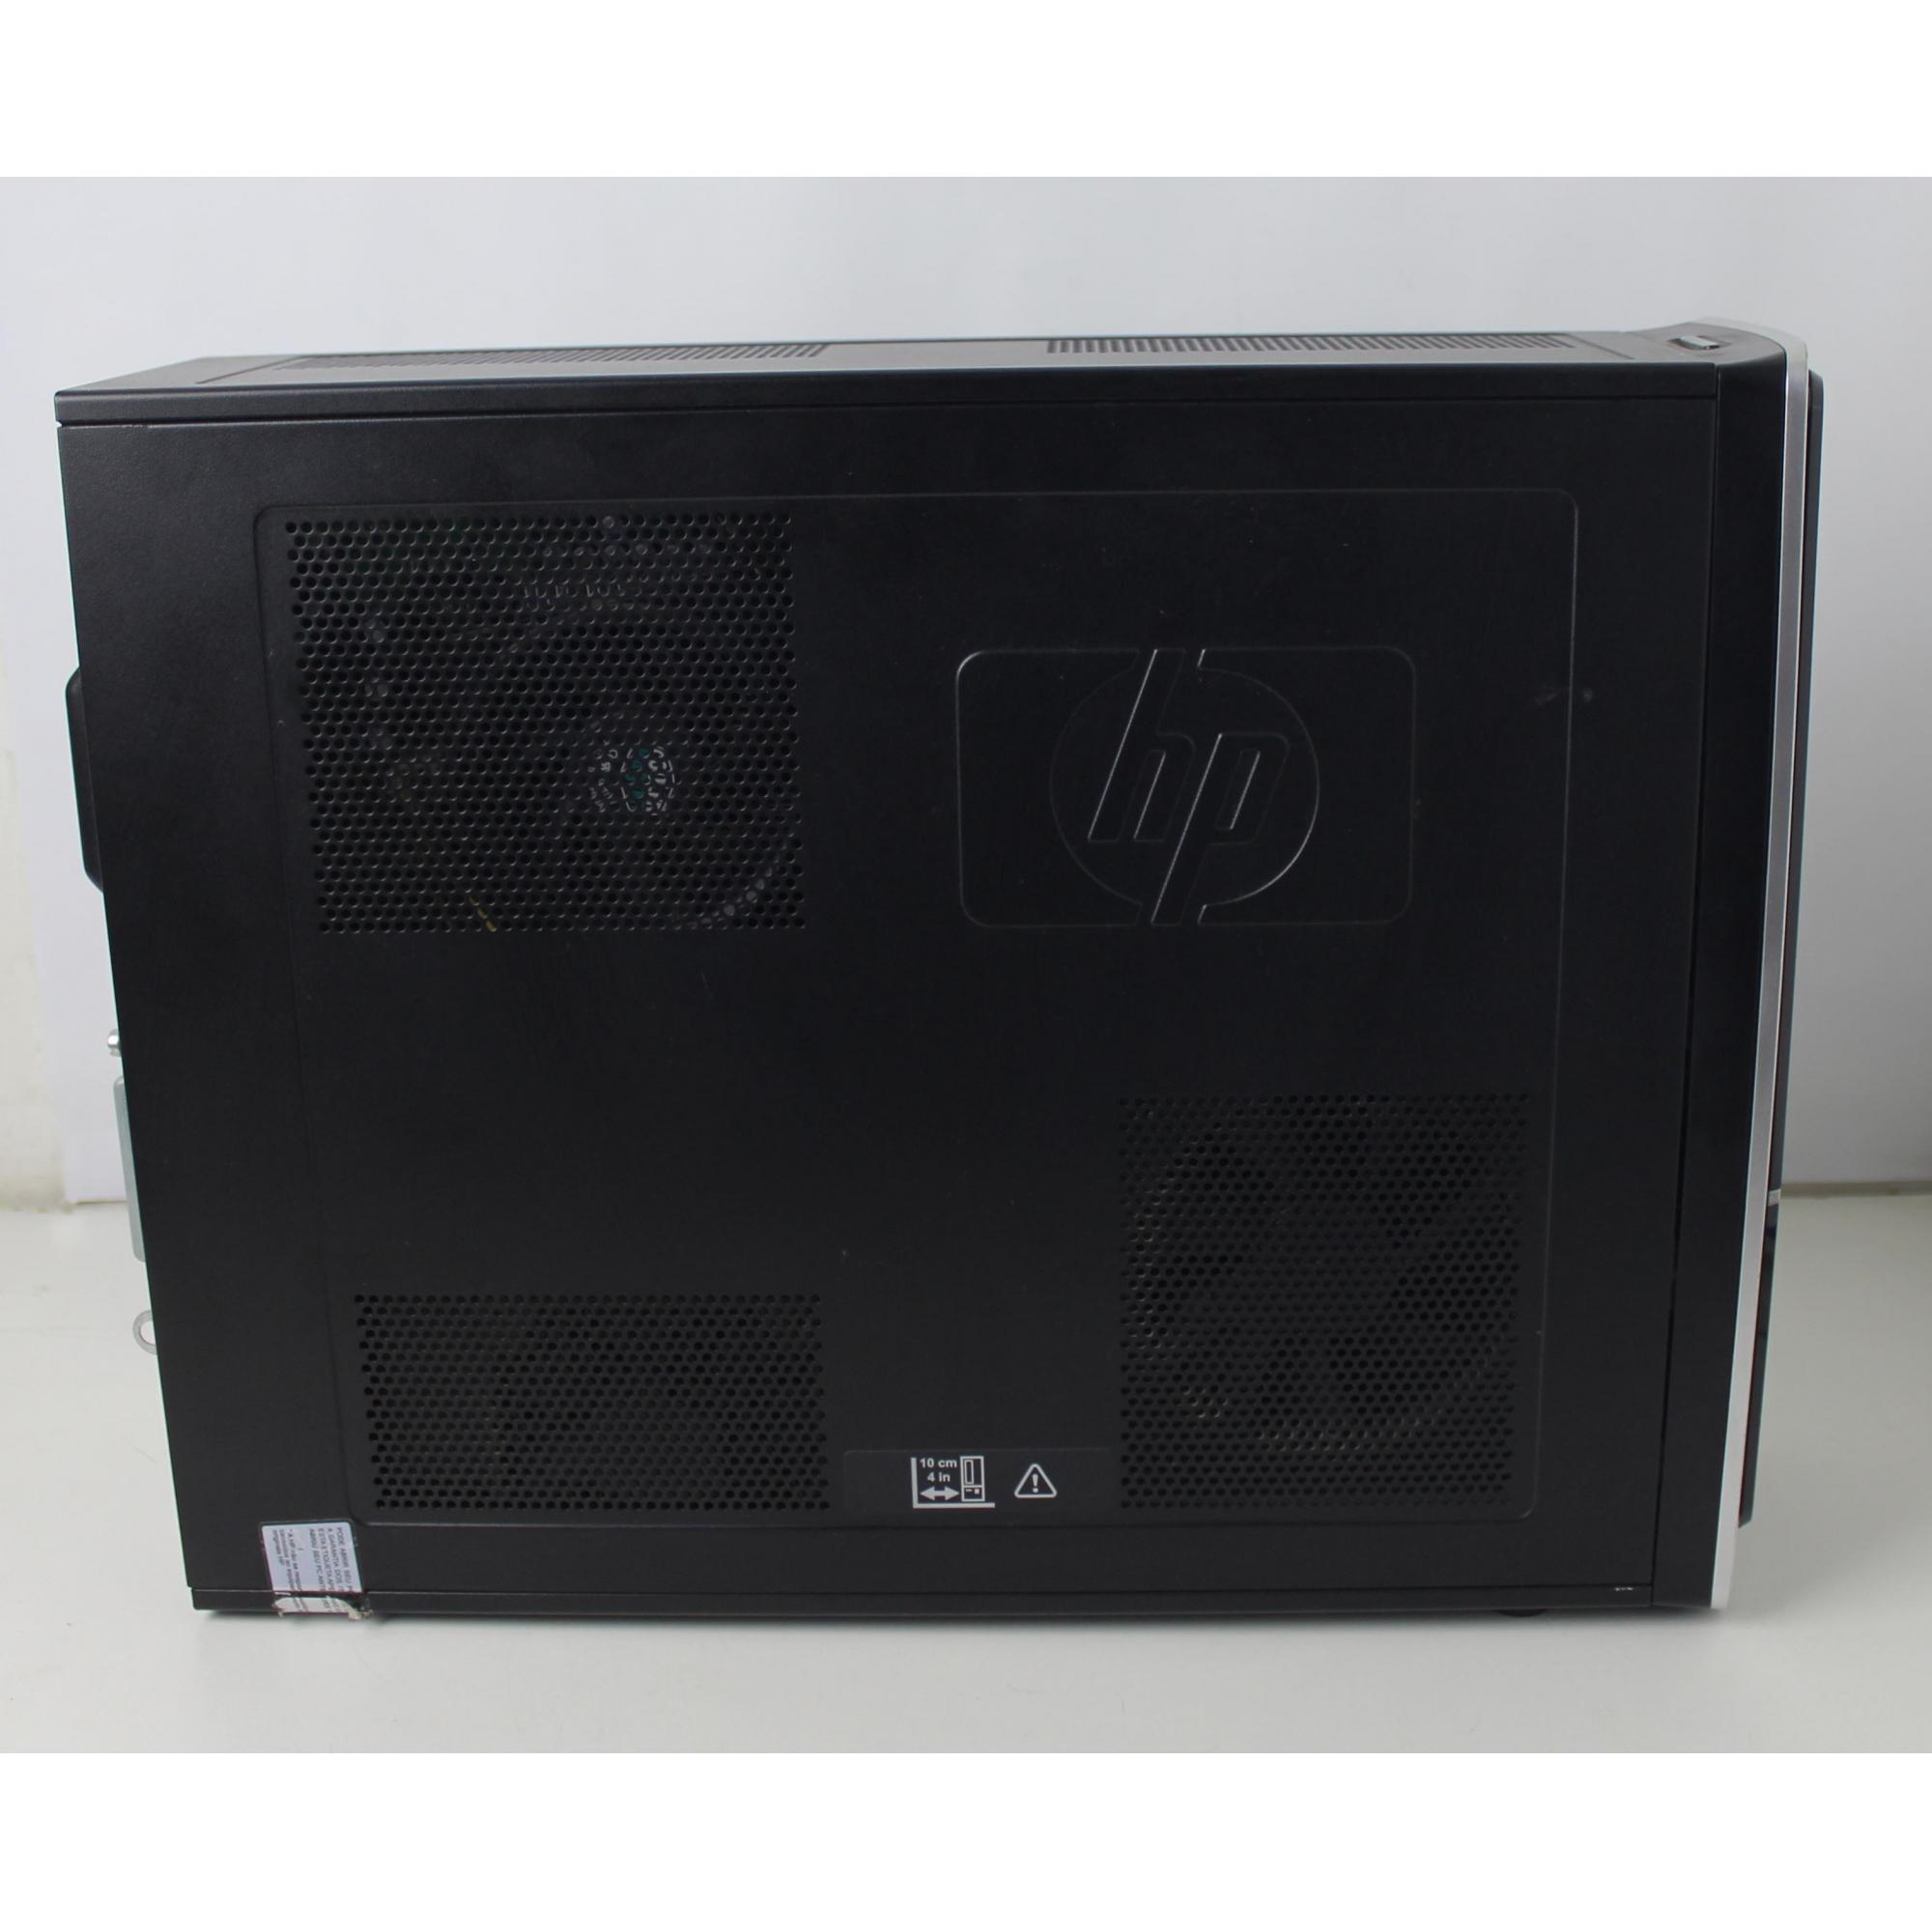 CPU HP PAVILION SLIMLINE INTEL CORE I3 3.2GHZ 4GB HD-500GB